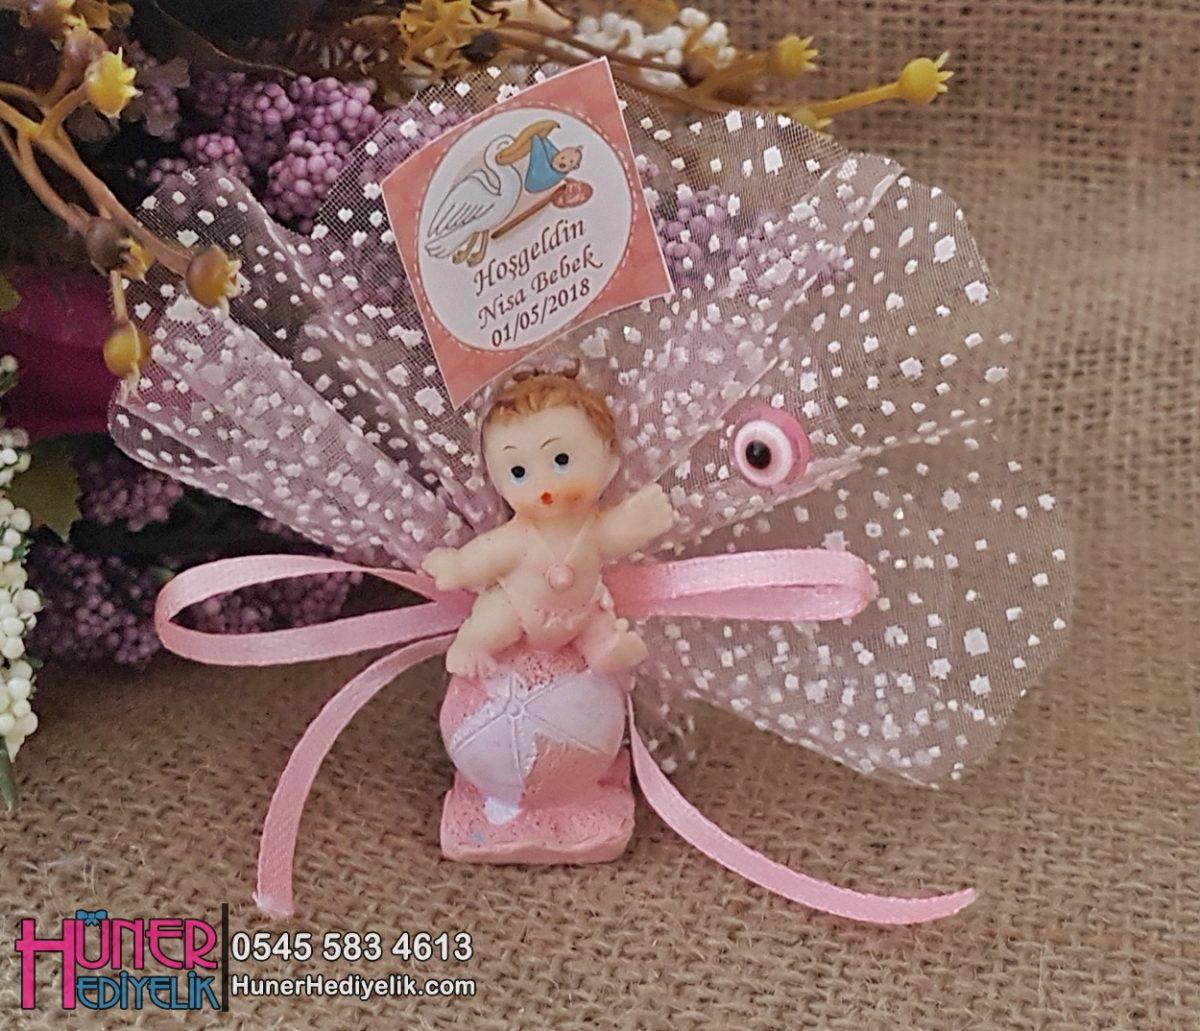 Pembe Top Üstünde Duran Kız Bebek Şekeri Biblolu